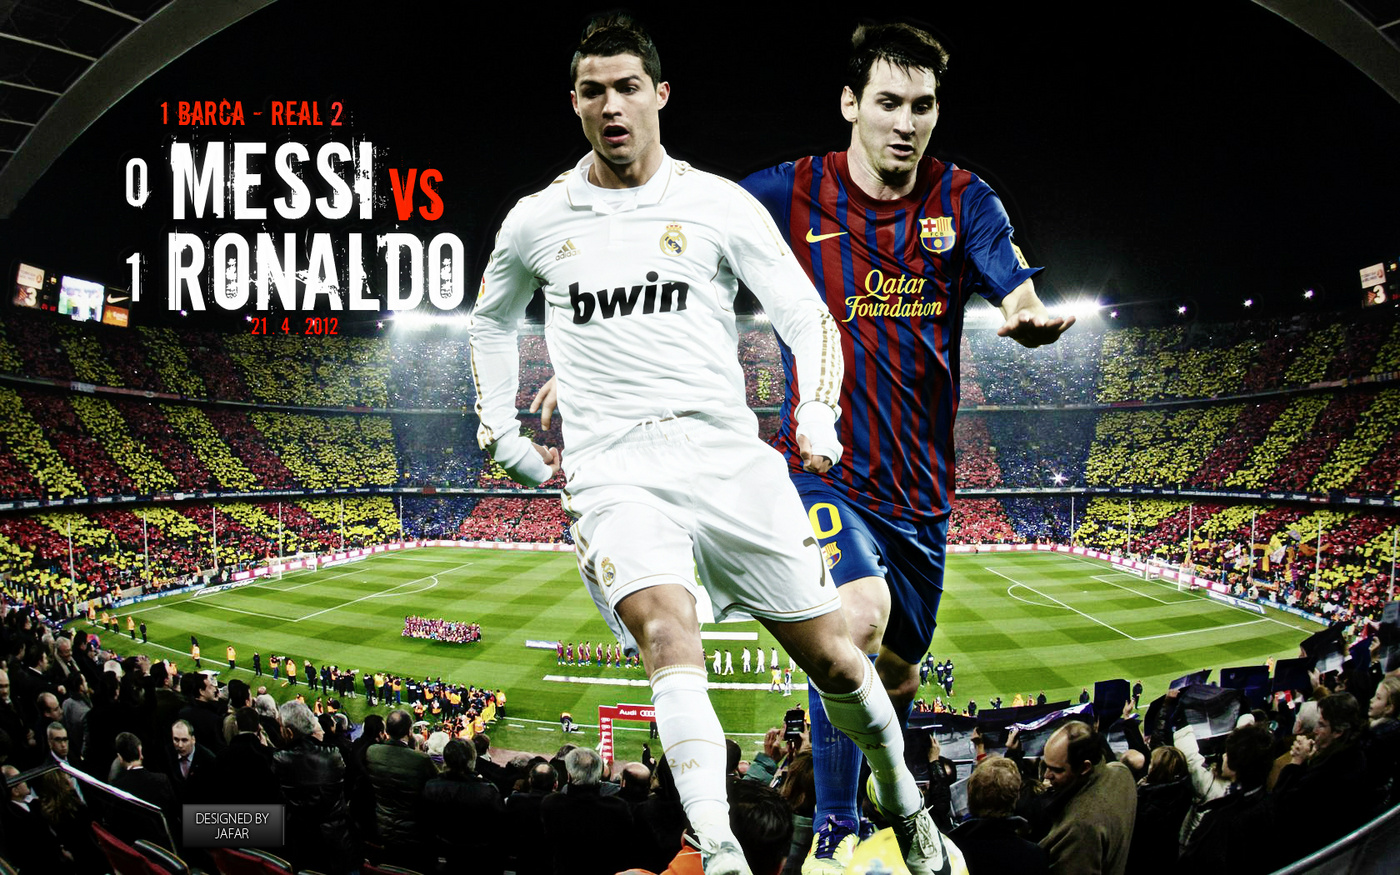 Ronaldo Vs Messi Wallpaper 2014 Messi vs Ronaldo Wallp...